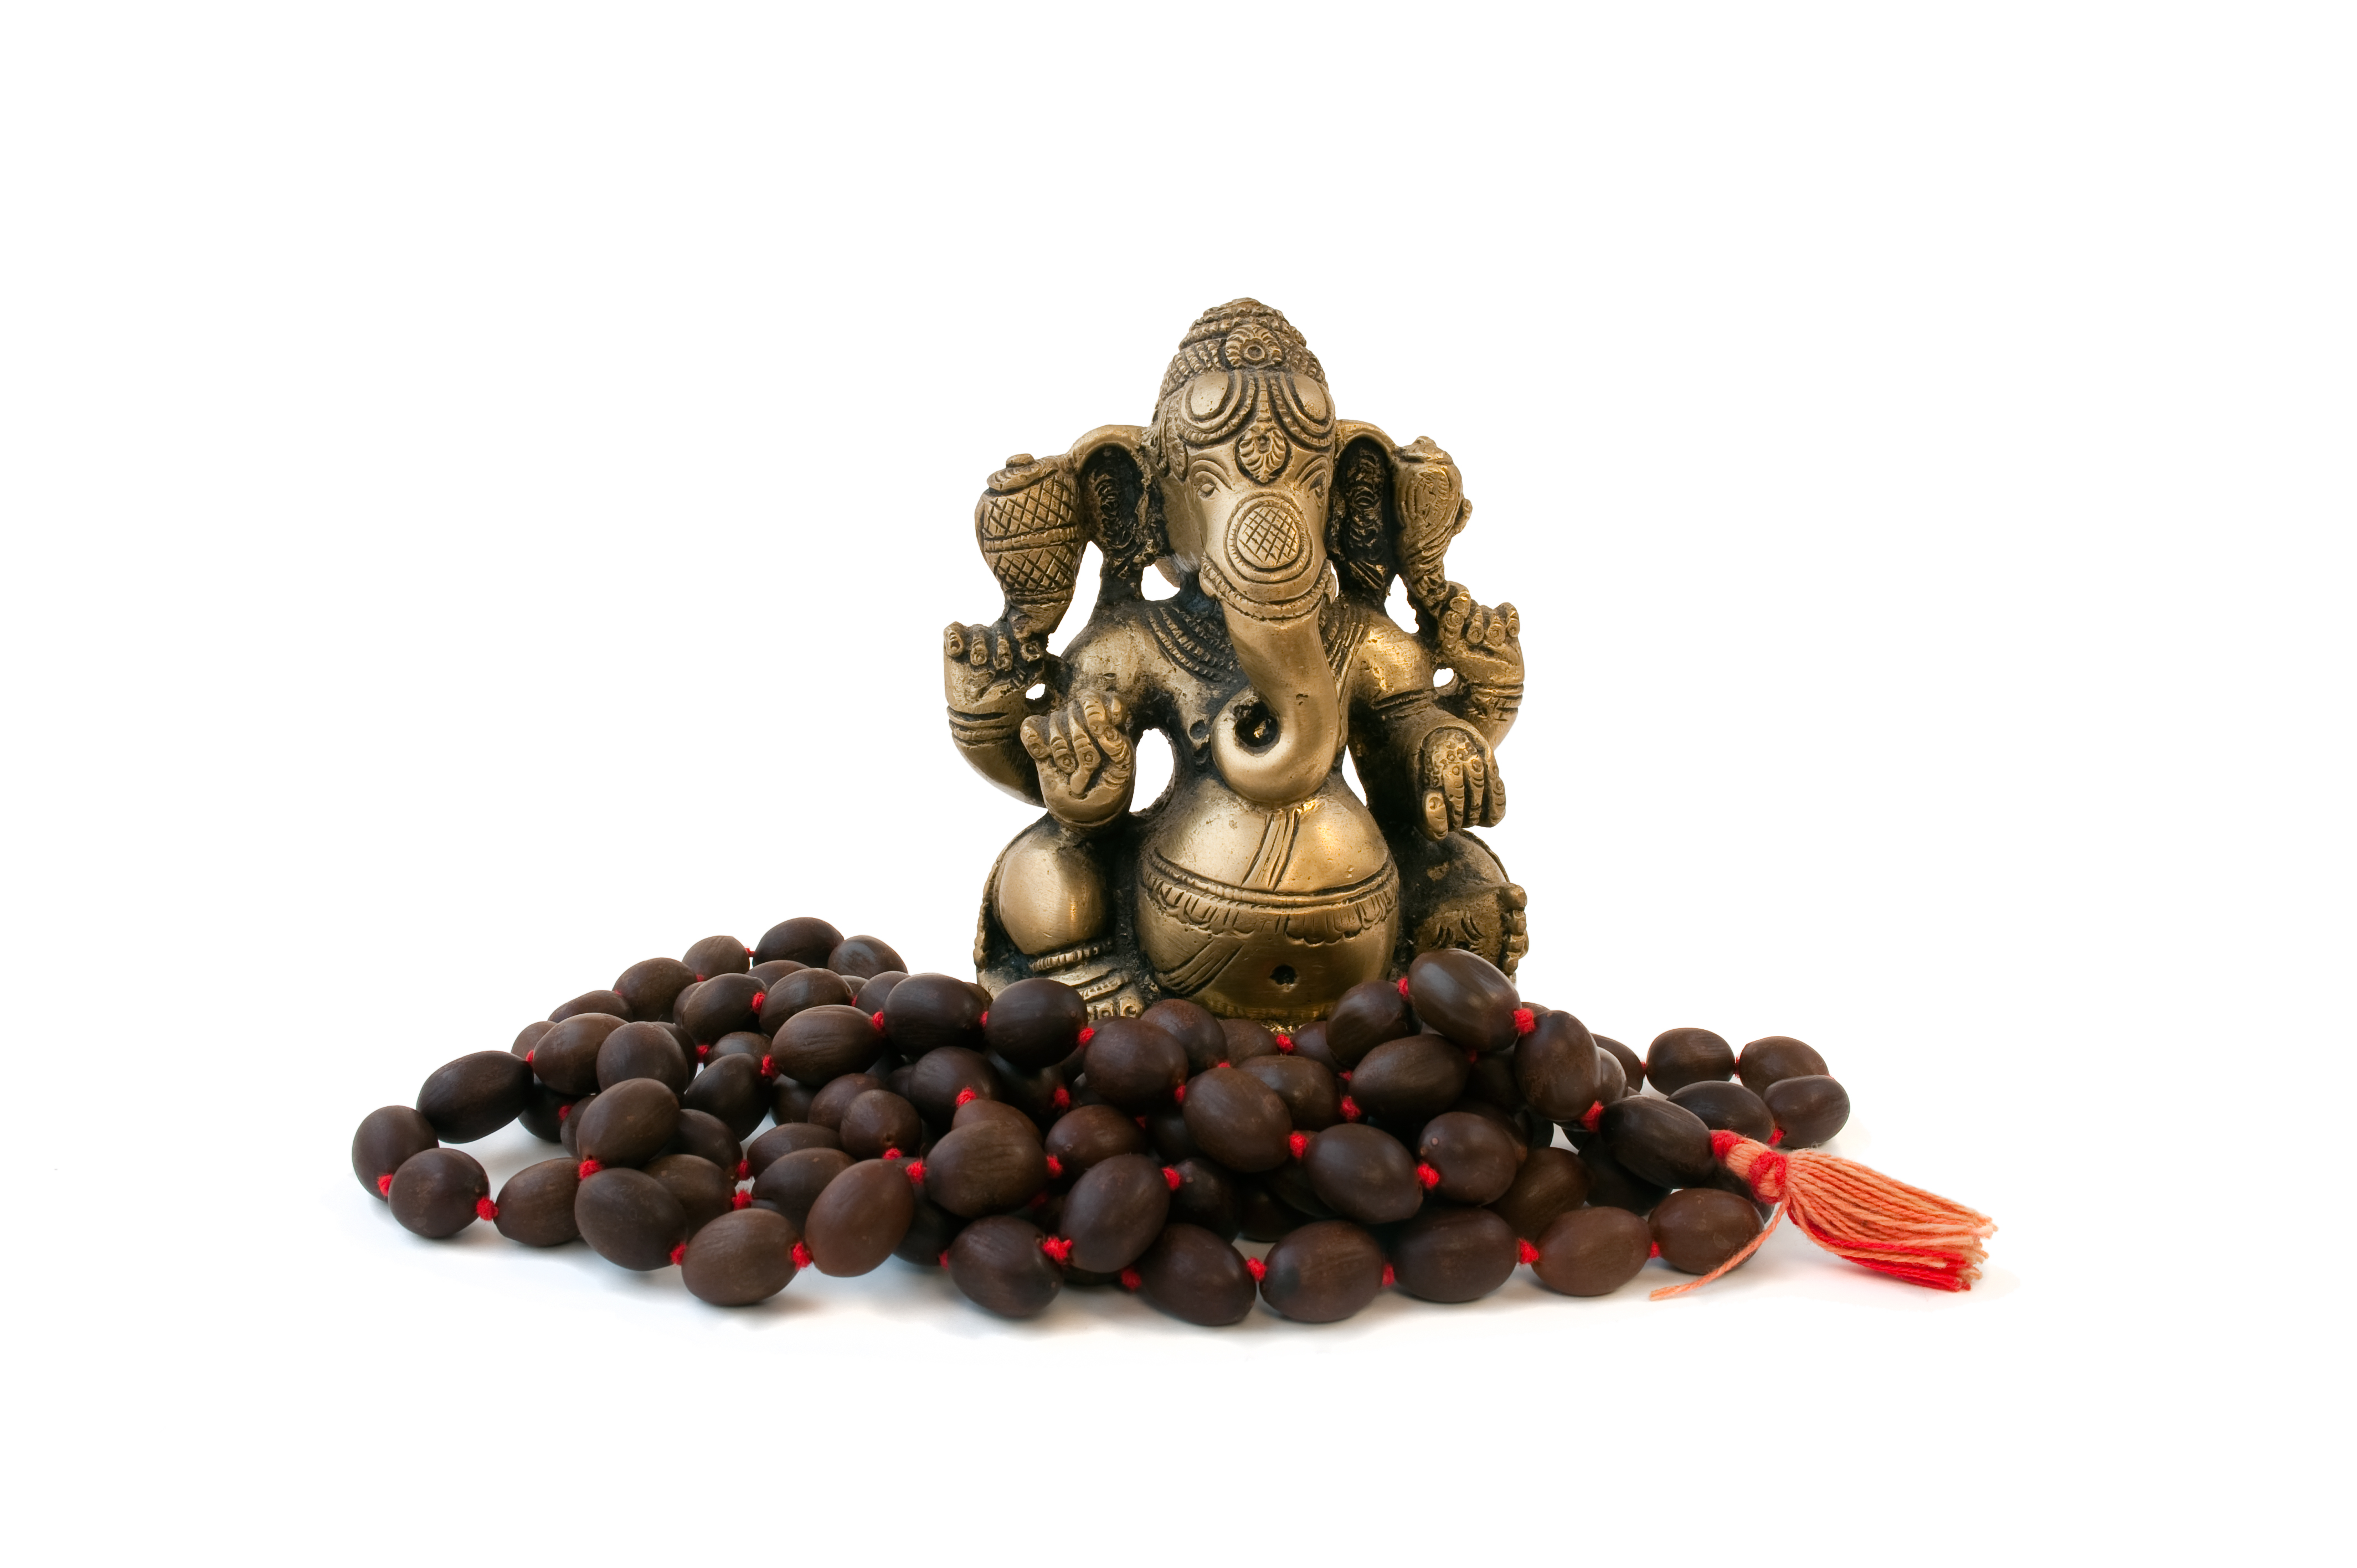 Lord Ganesha Hindu Wedding Blessing | HuffPost Life